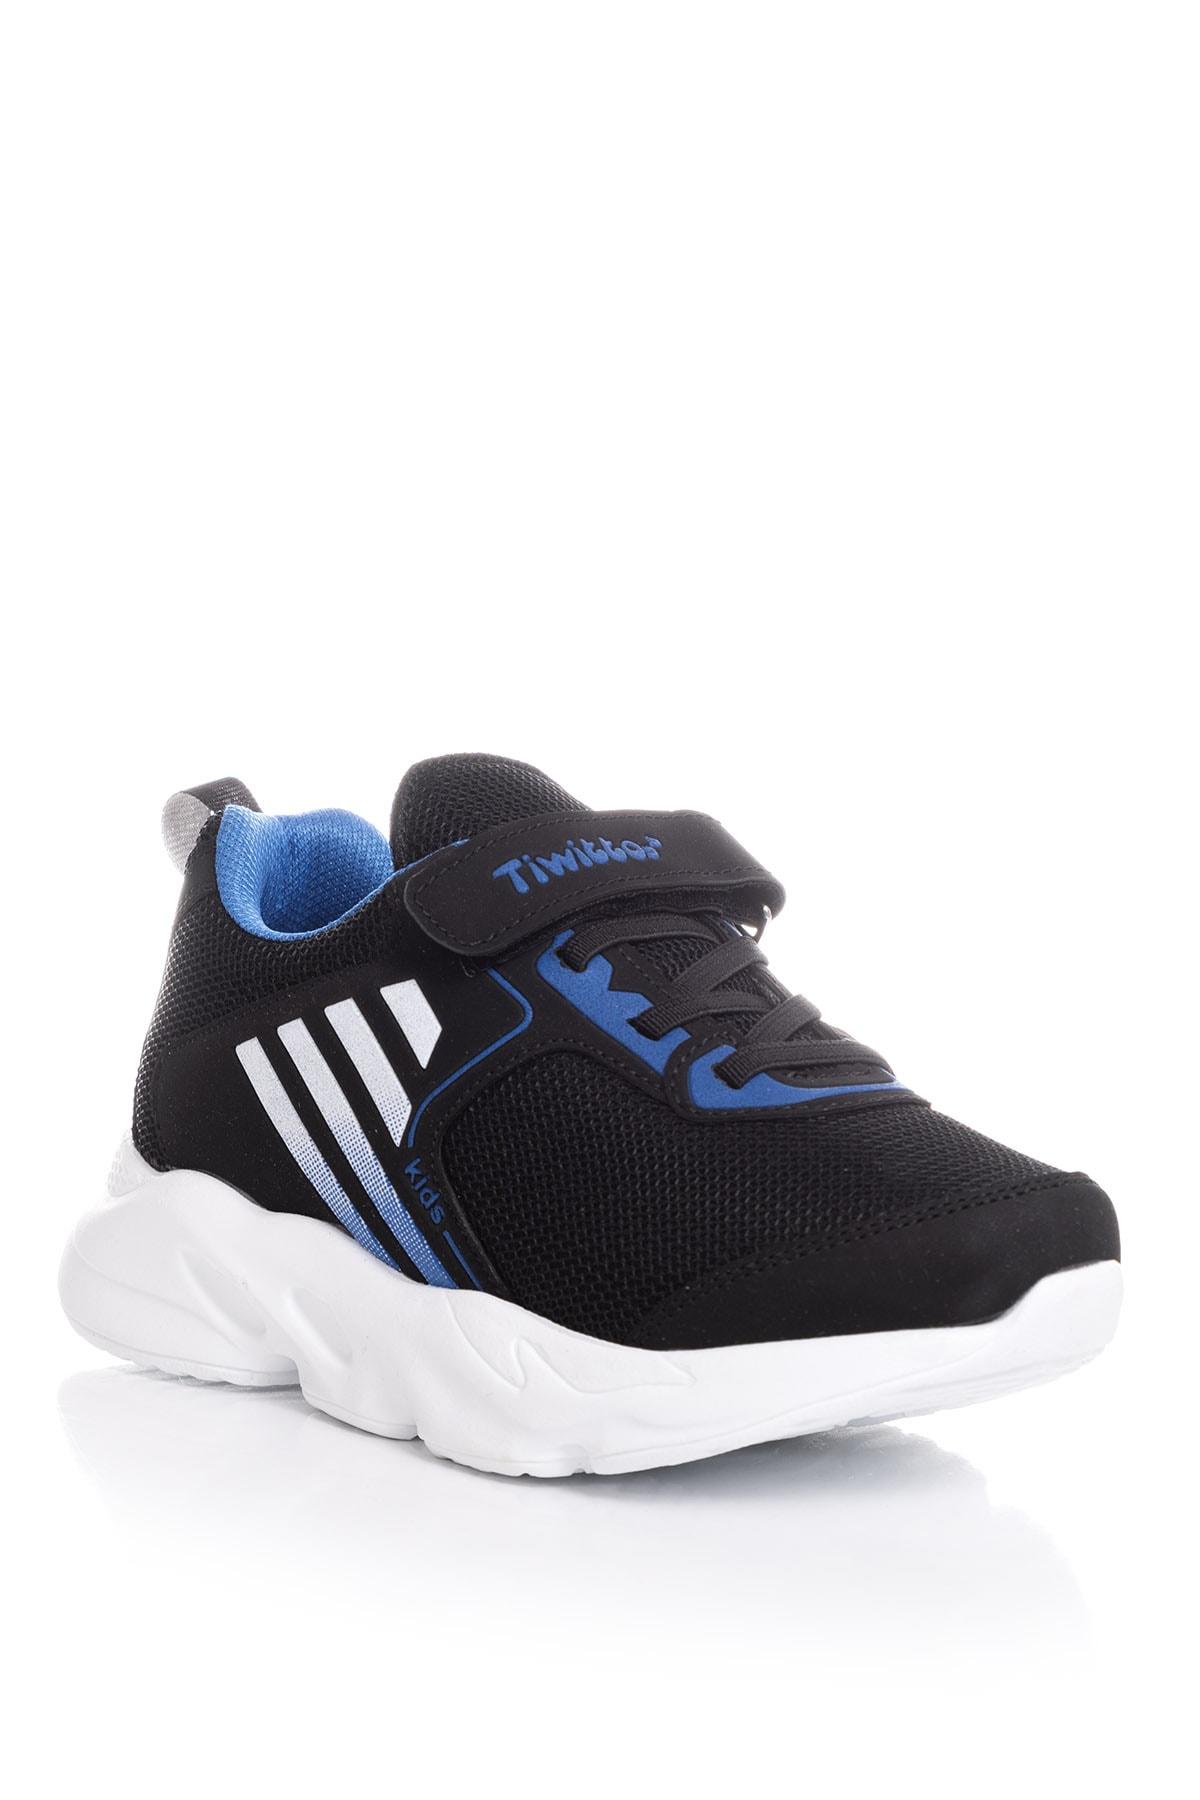 Tonny Black Siyah Sax Unisex Çocuk Sneaker TBZ05-3 1